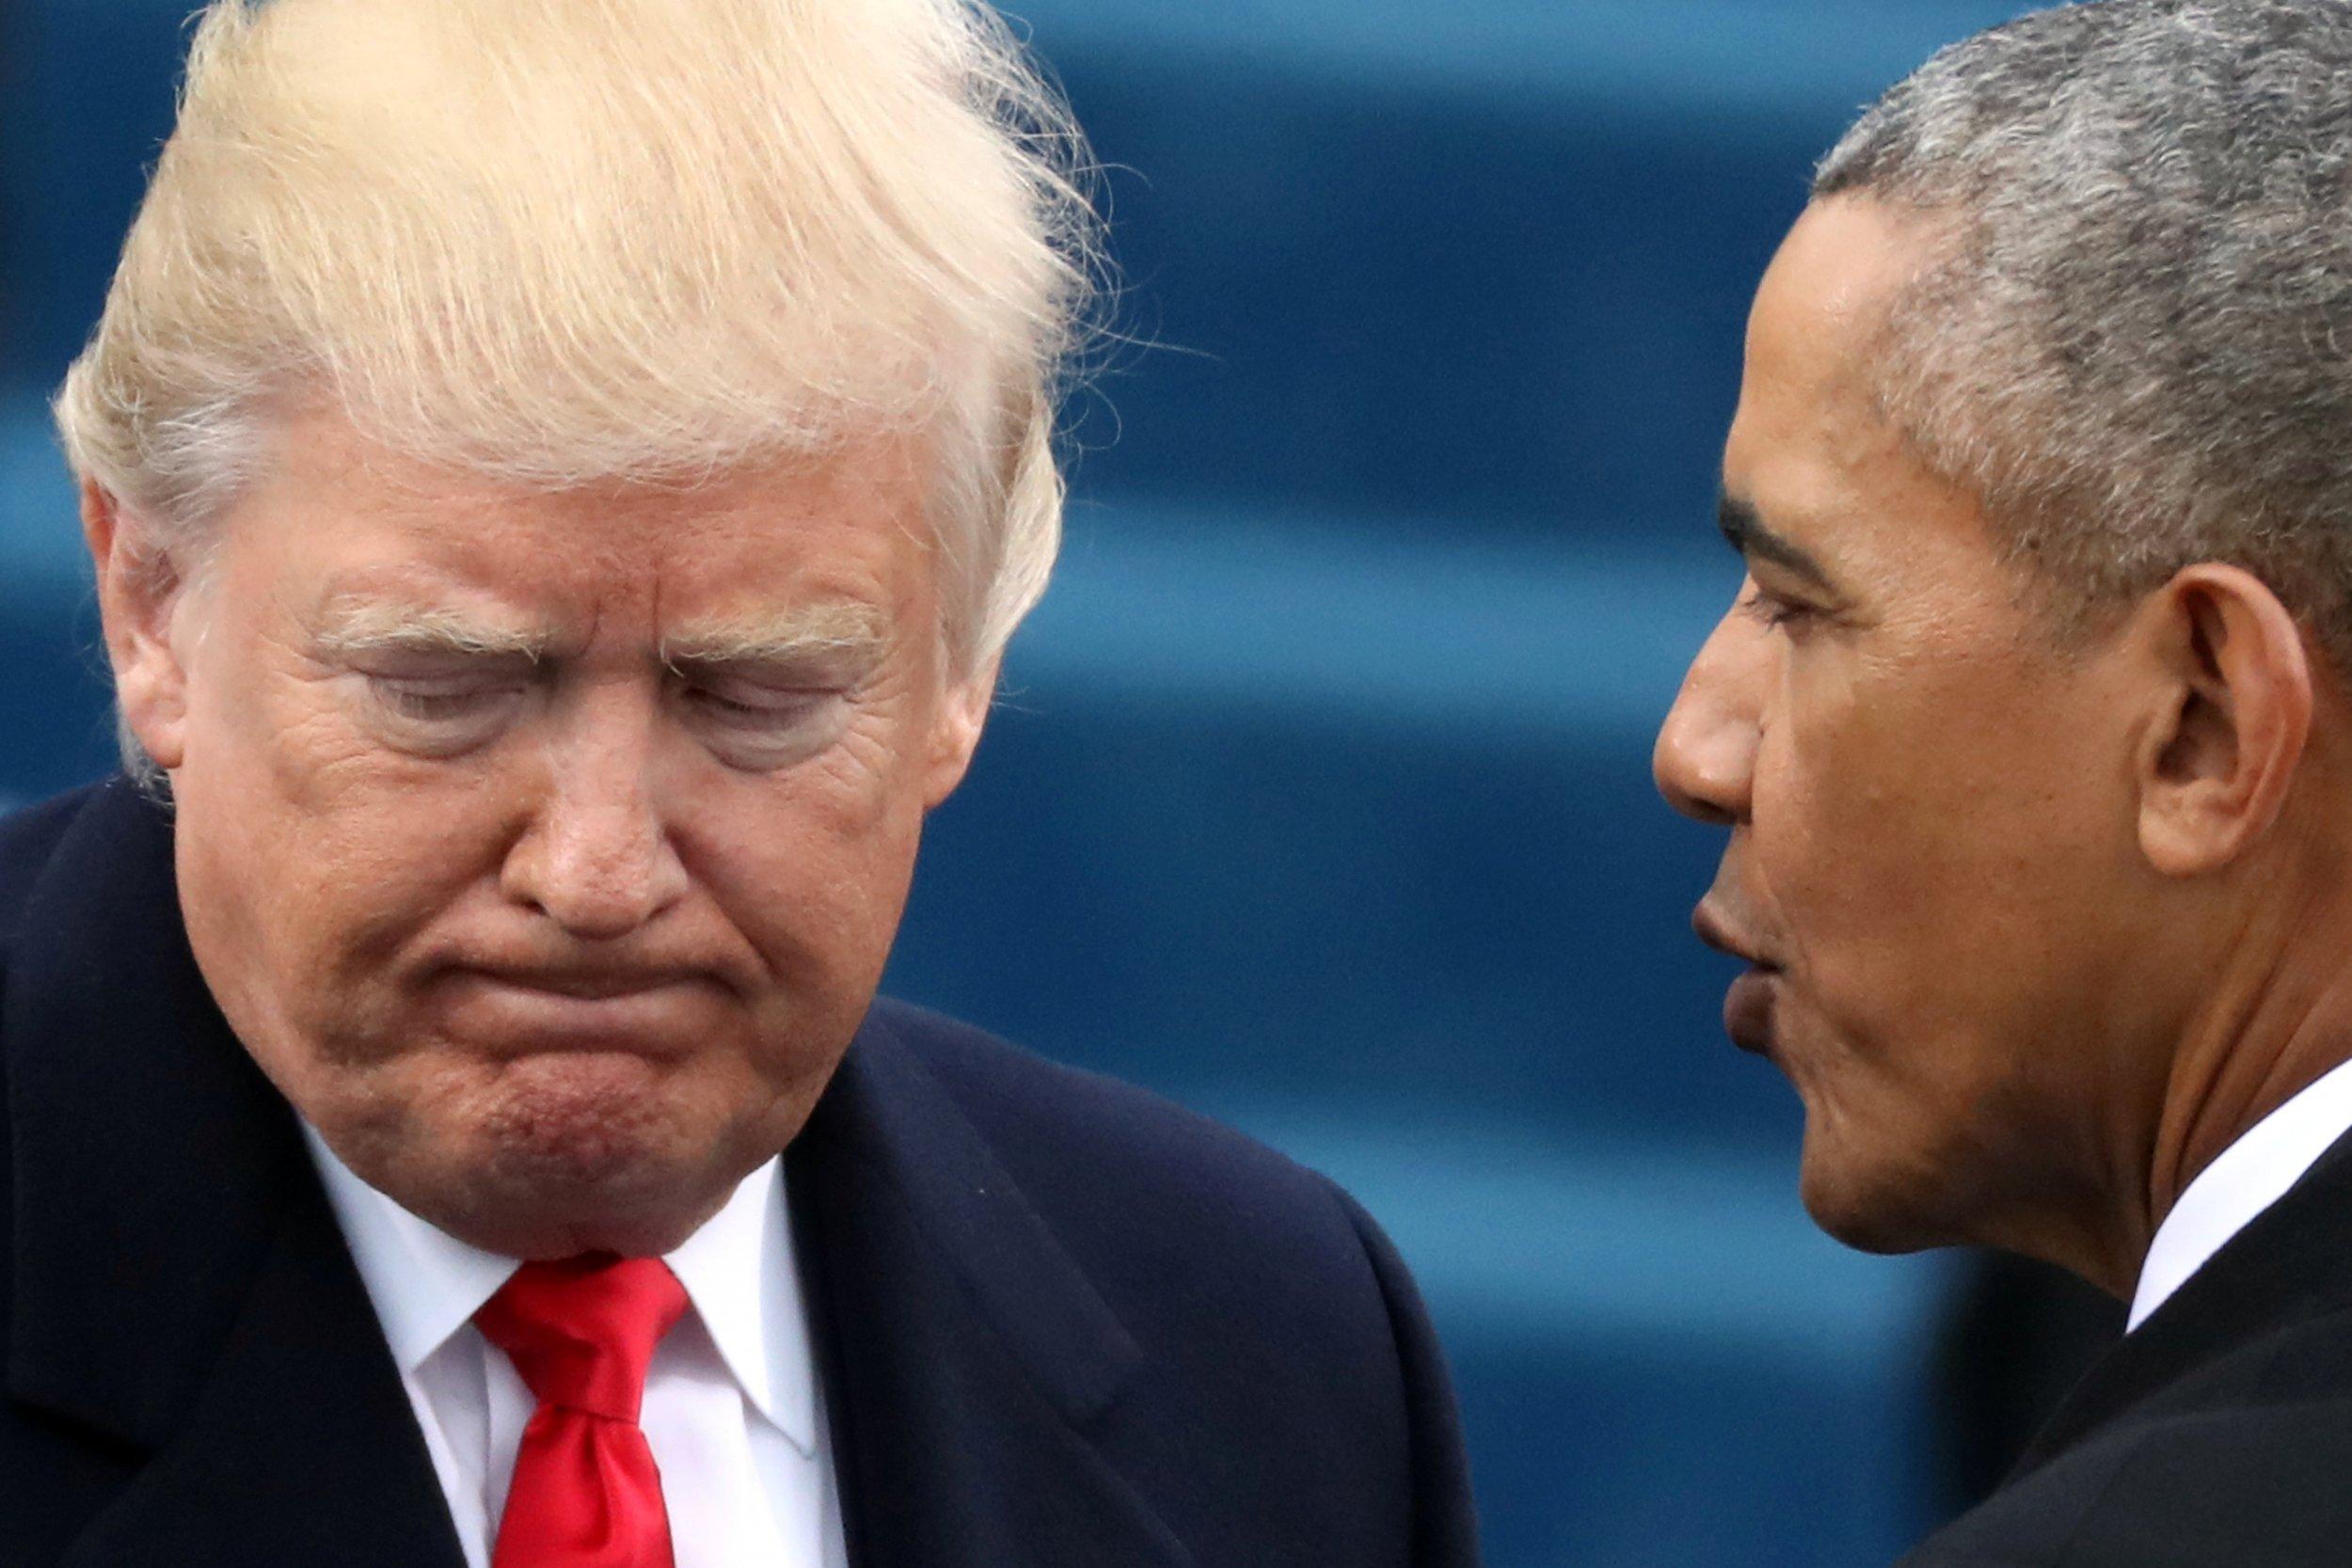 11_27_BarackObama_DonaldTrump_TaxpayerExpenses